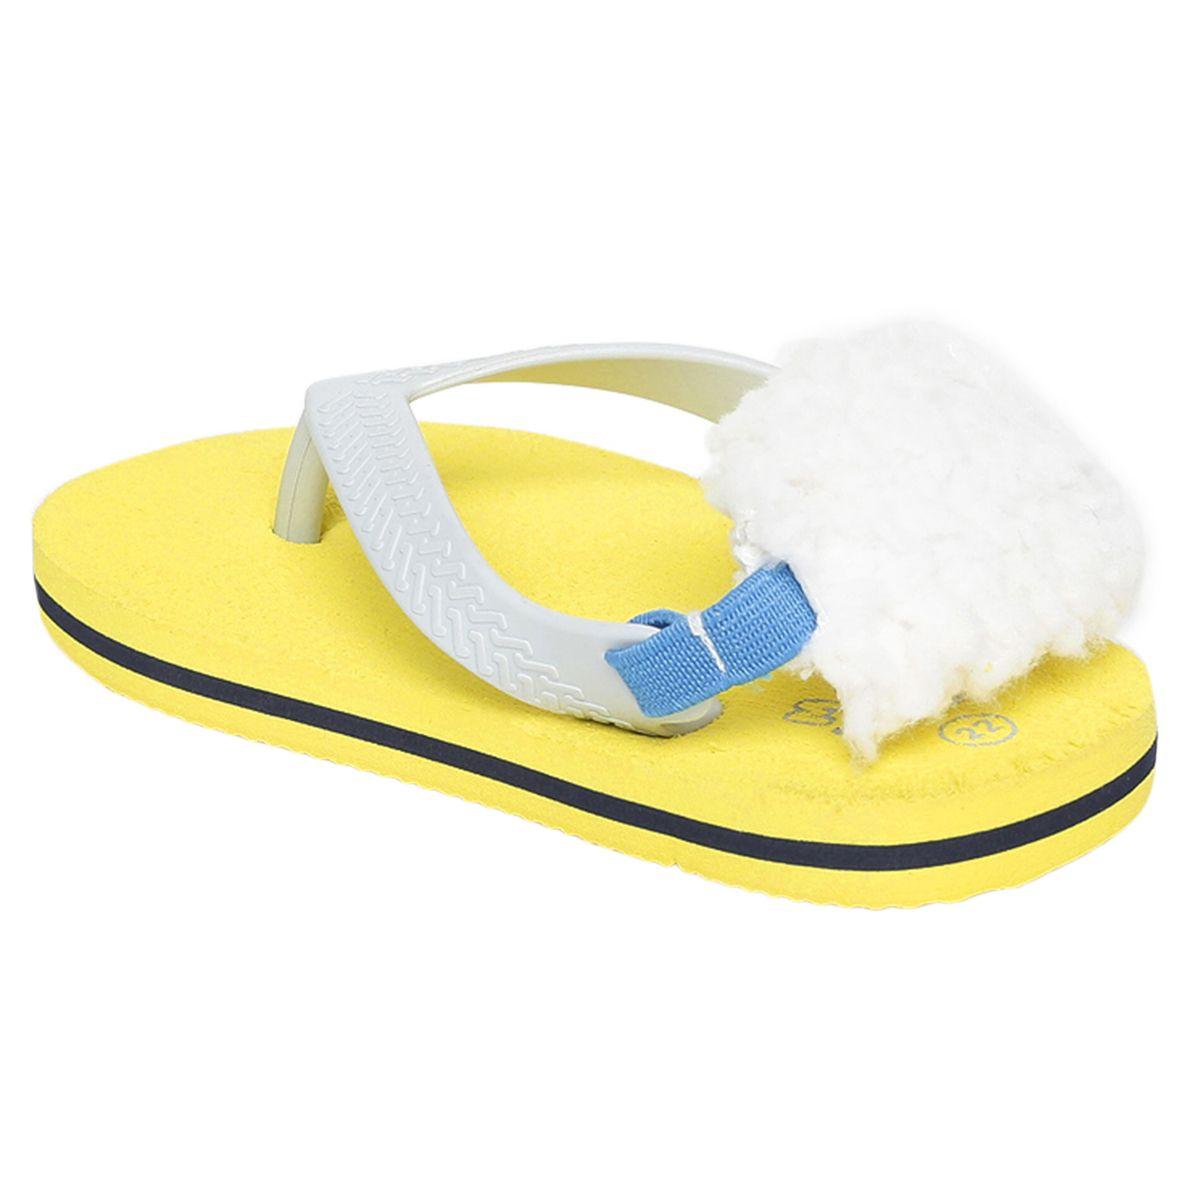 Miniklub Boys Yellow Solid Hardsole Slippers